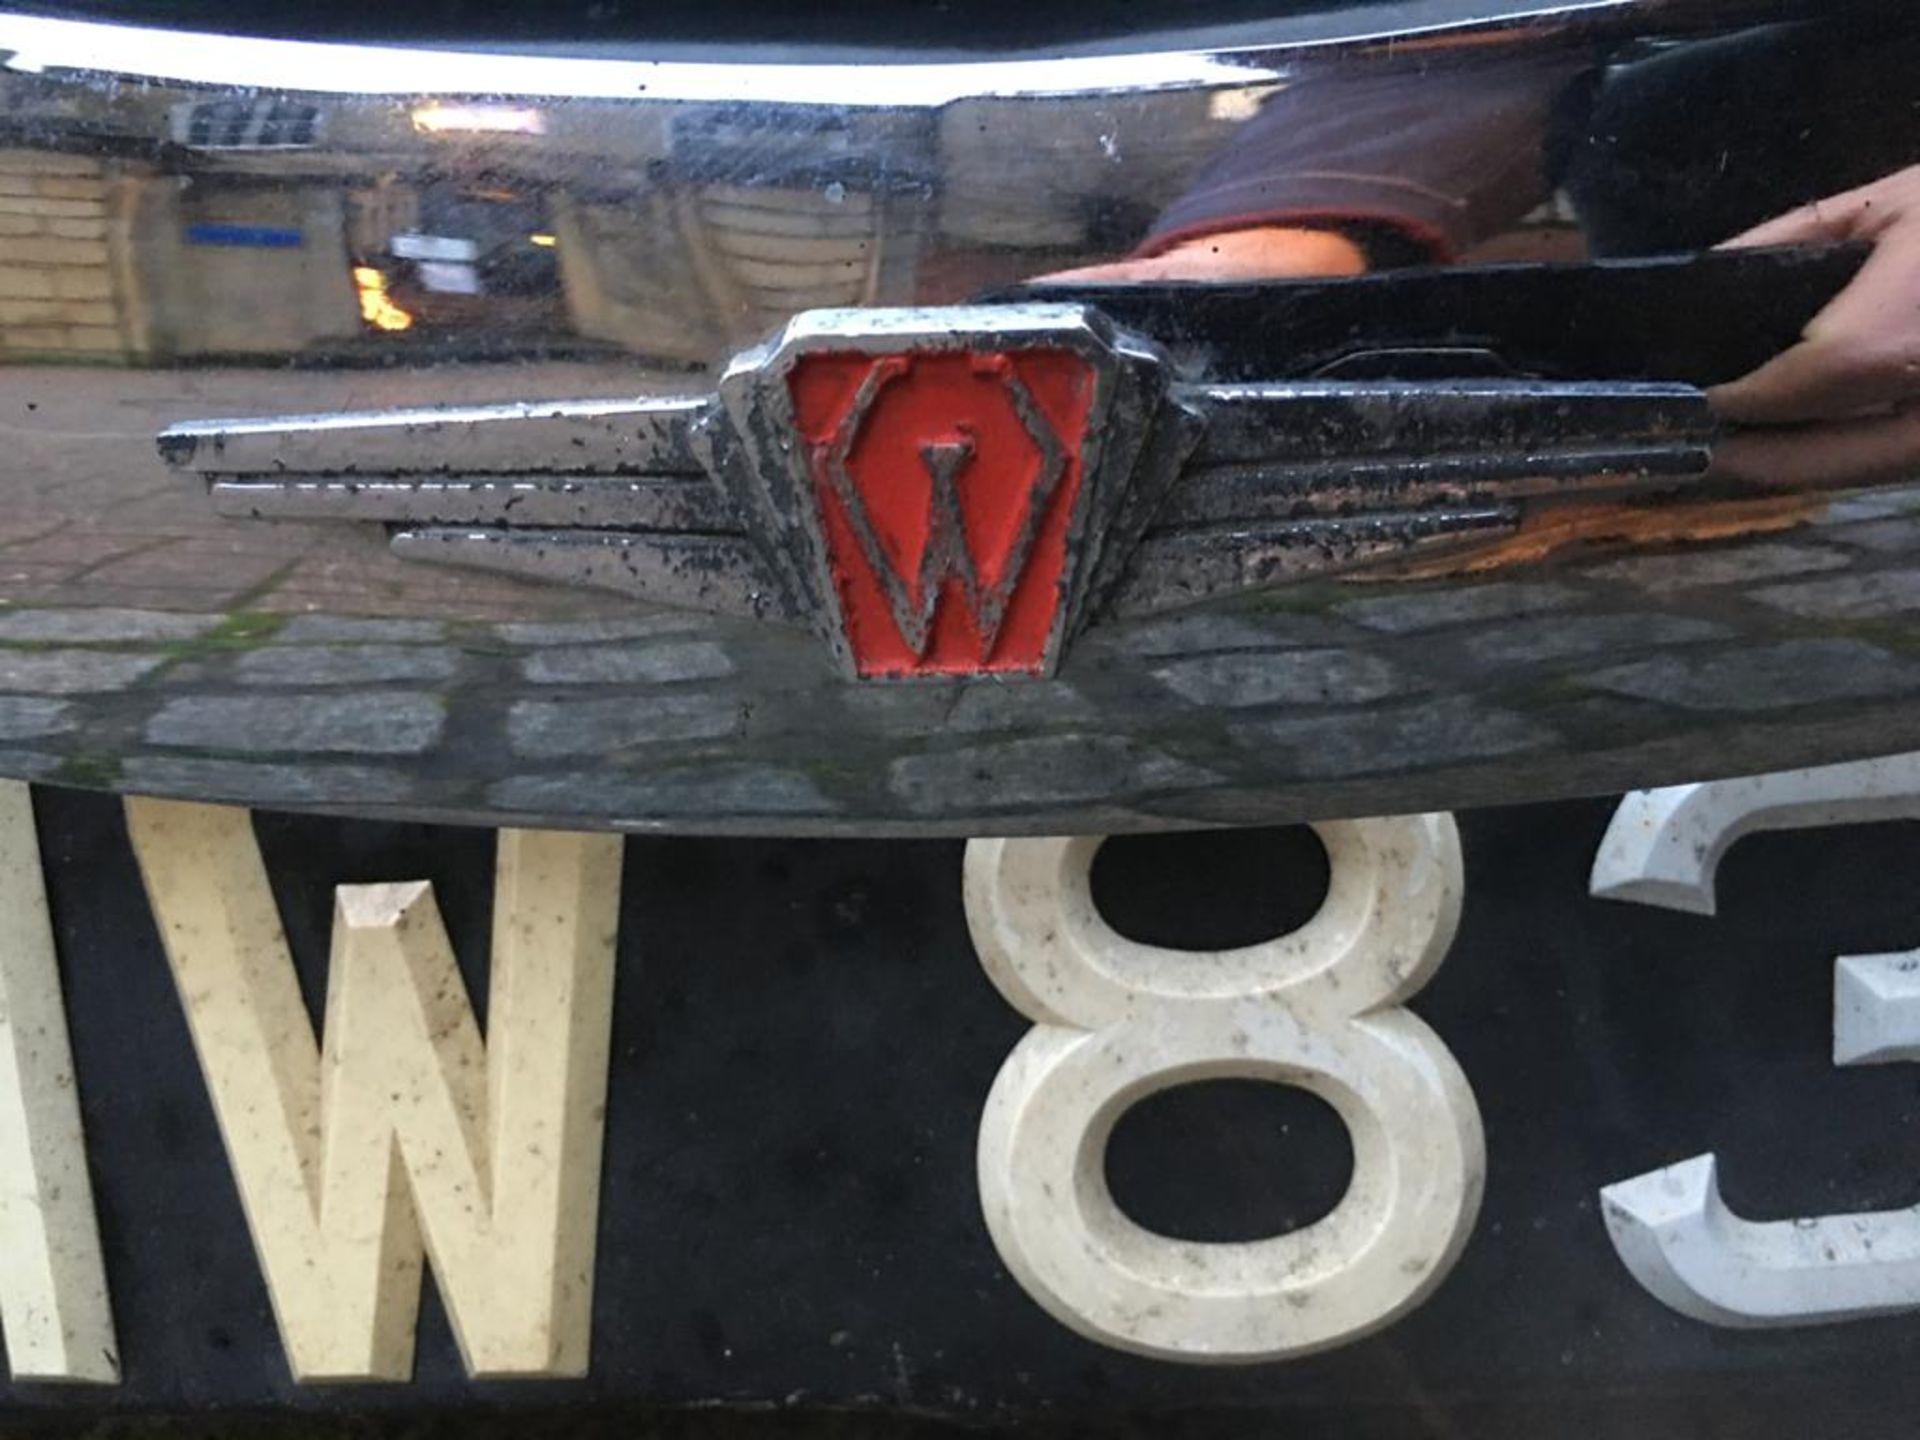 1938 WOLSELEY 25 CLASSIC 4.0 - Image 19 of 35